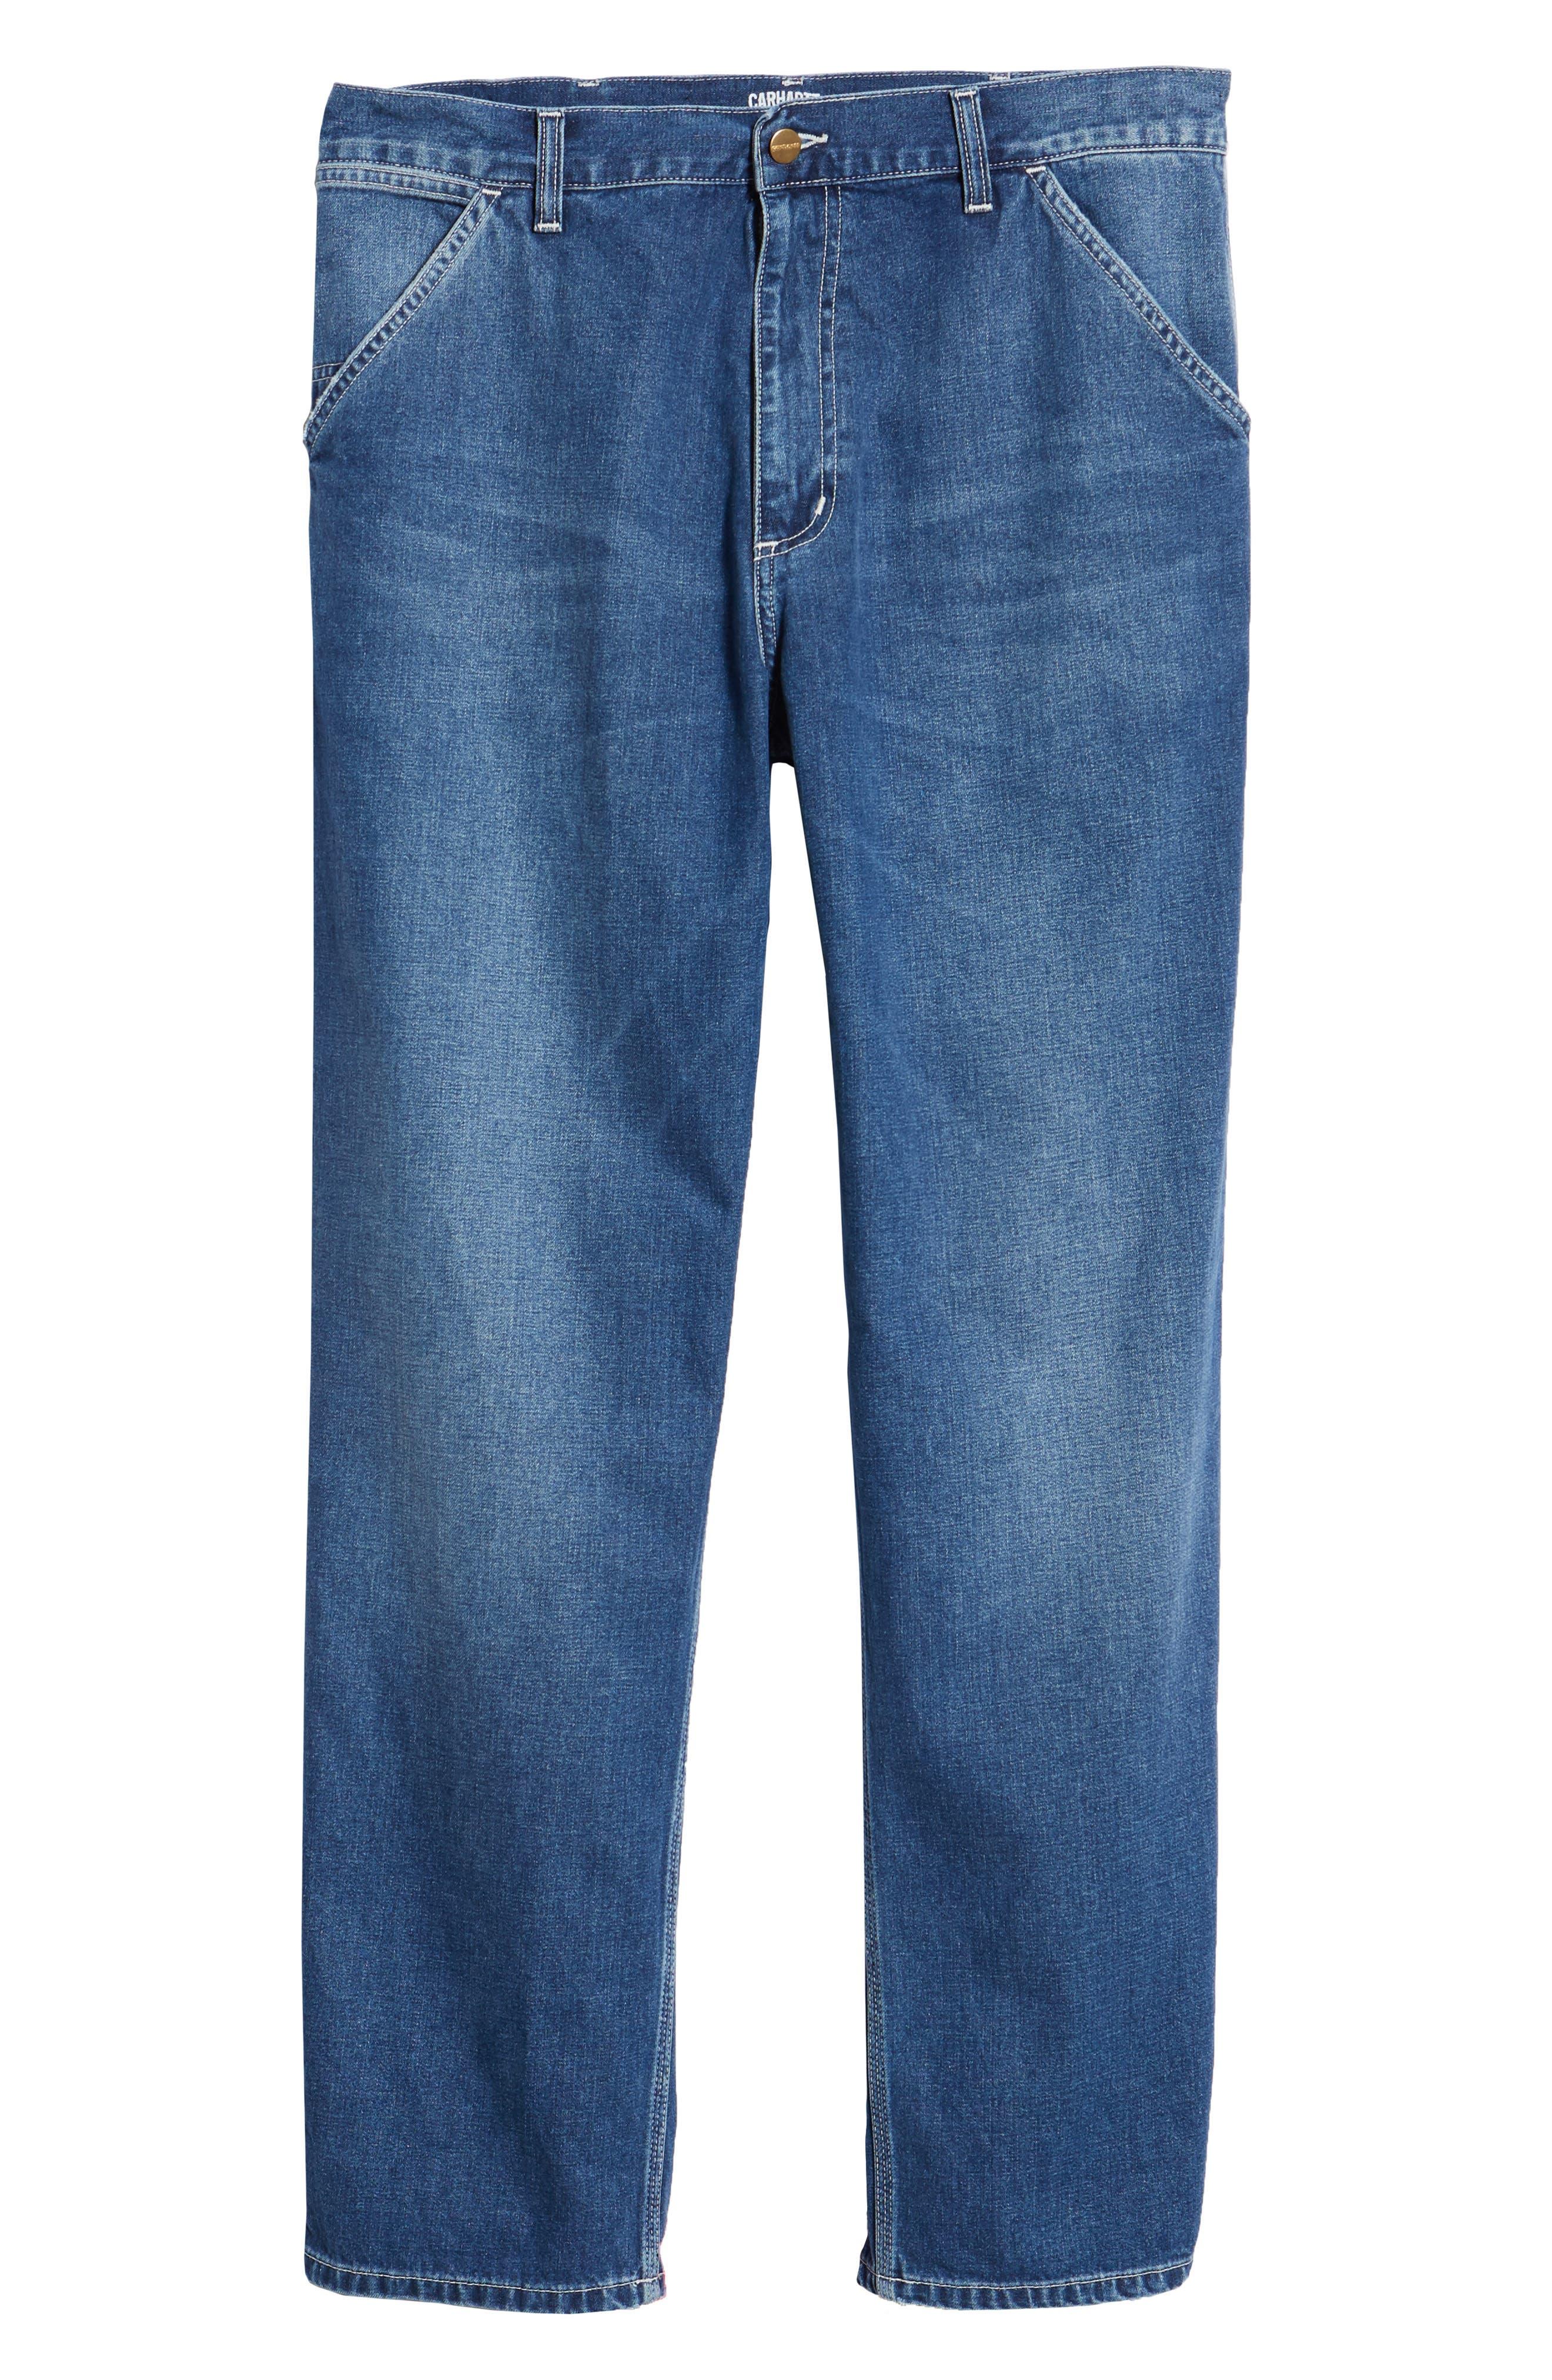 CARHARTT WORK IN PROGRESS,                             Simple Denim Jeans,                             Alternate thumbnail 7, color,                             BLUE